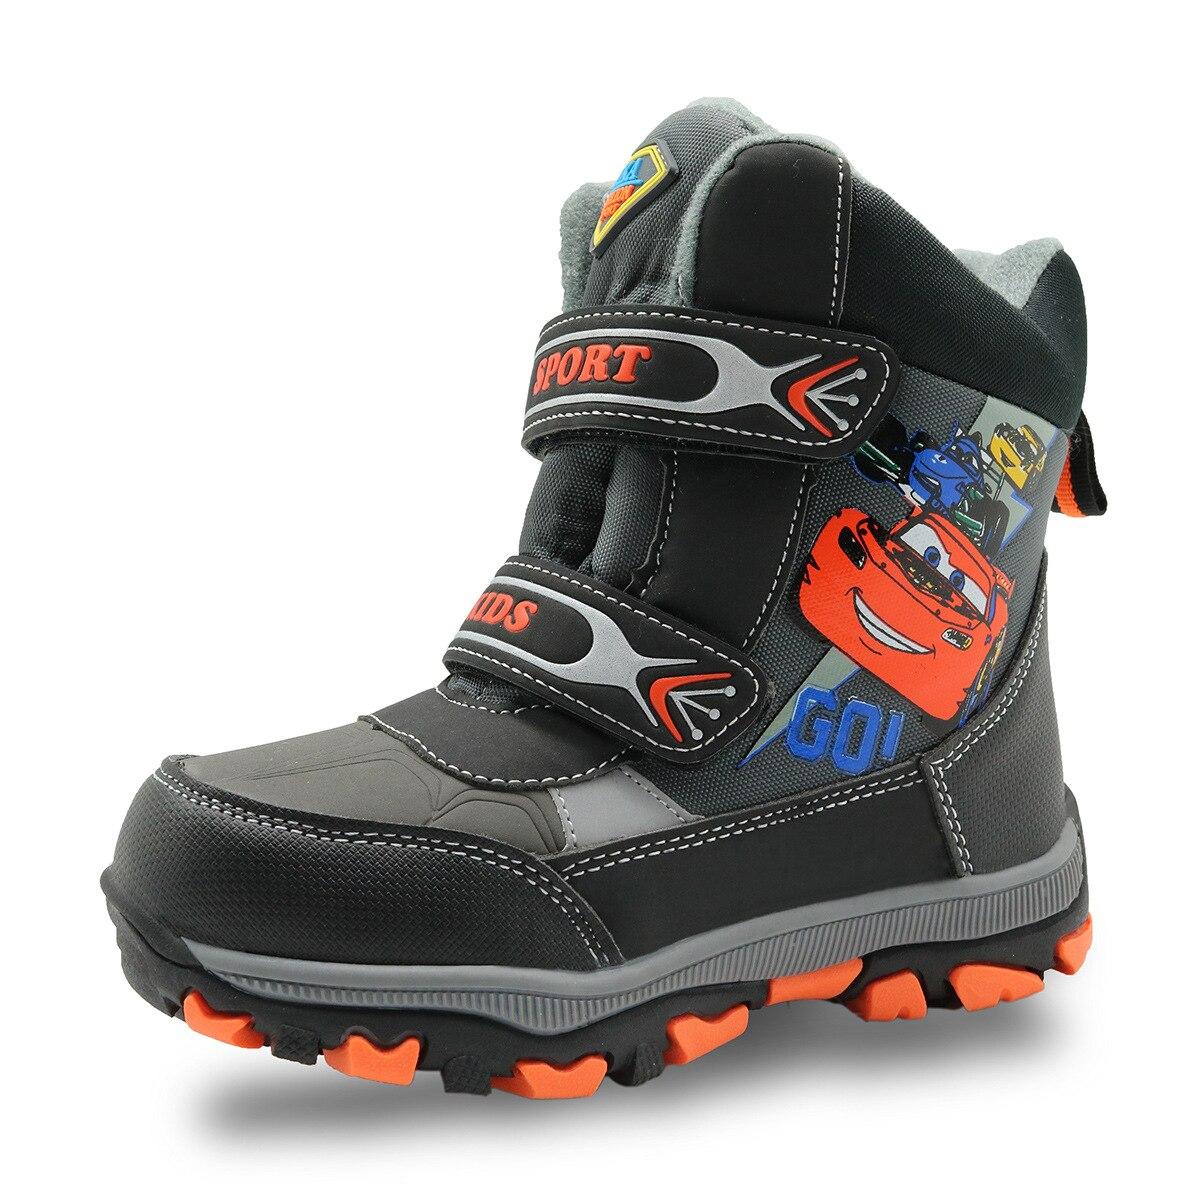 Winter Waterproof Boys font b Boots b font Mid Calf Rubber Children s Shoes Warm Plush